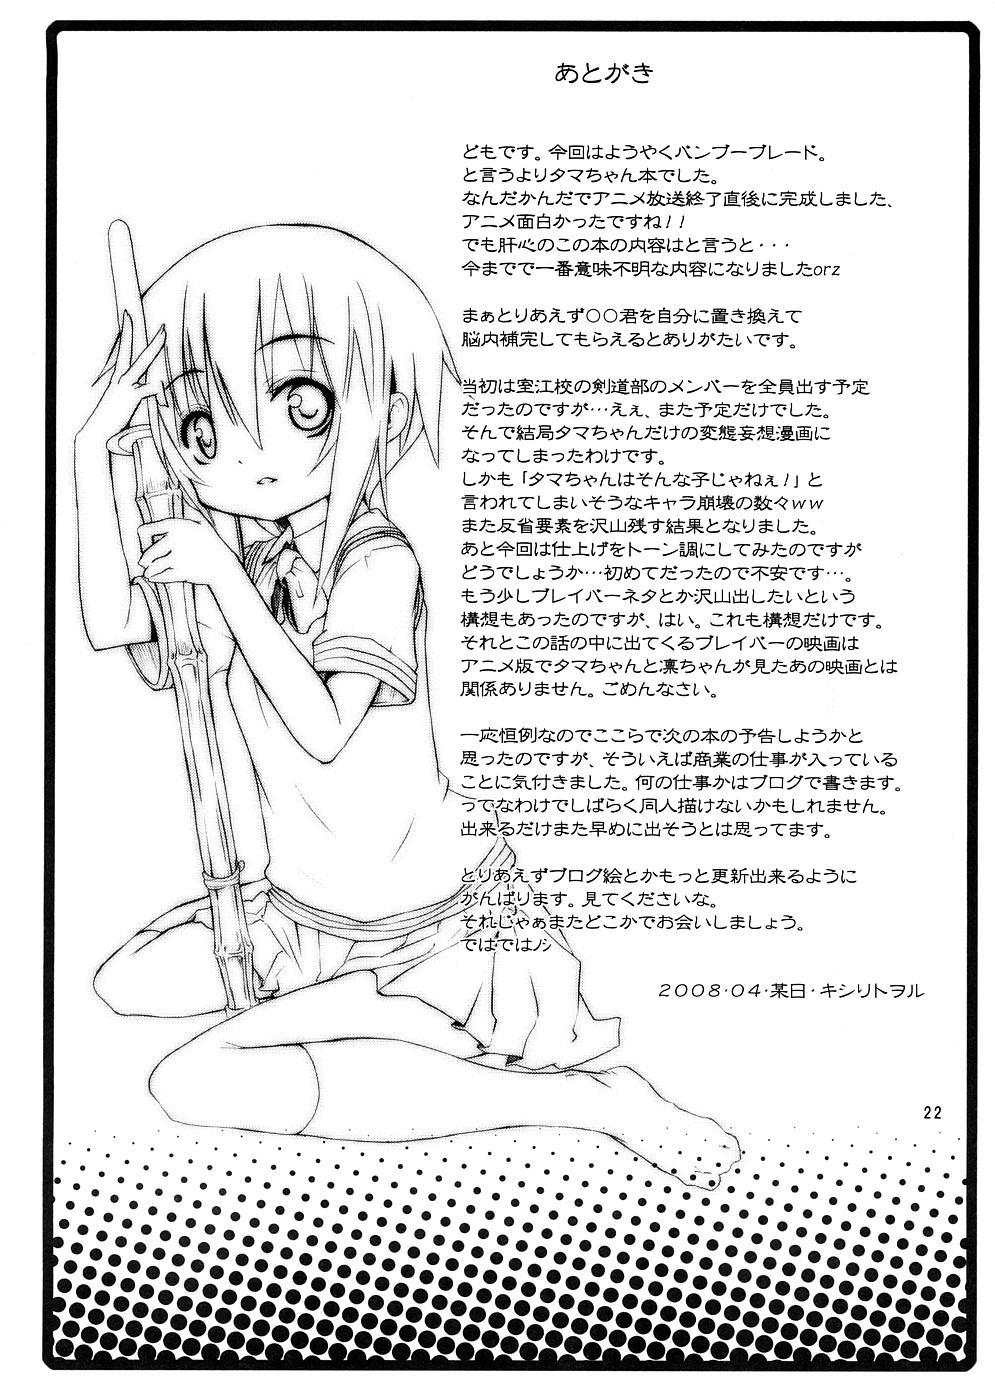 Tama-chan to Date. 20